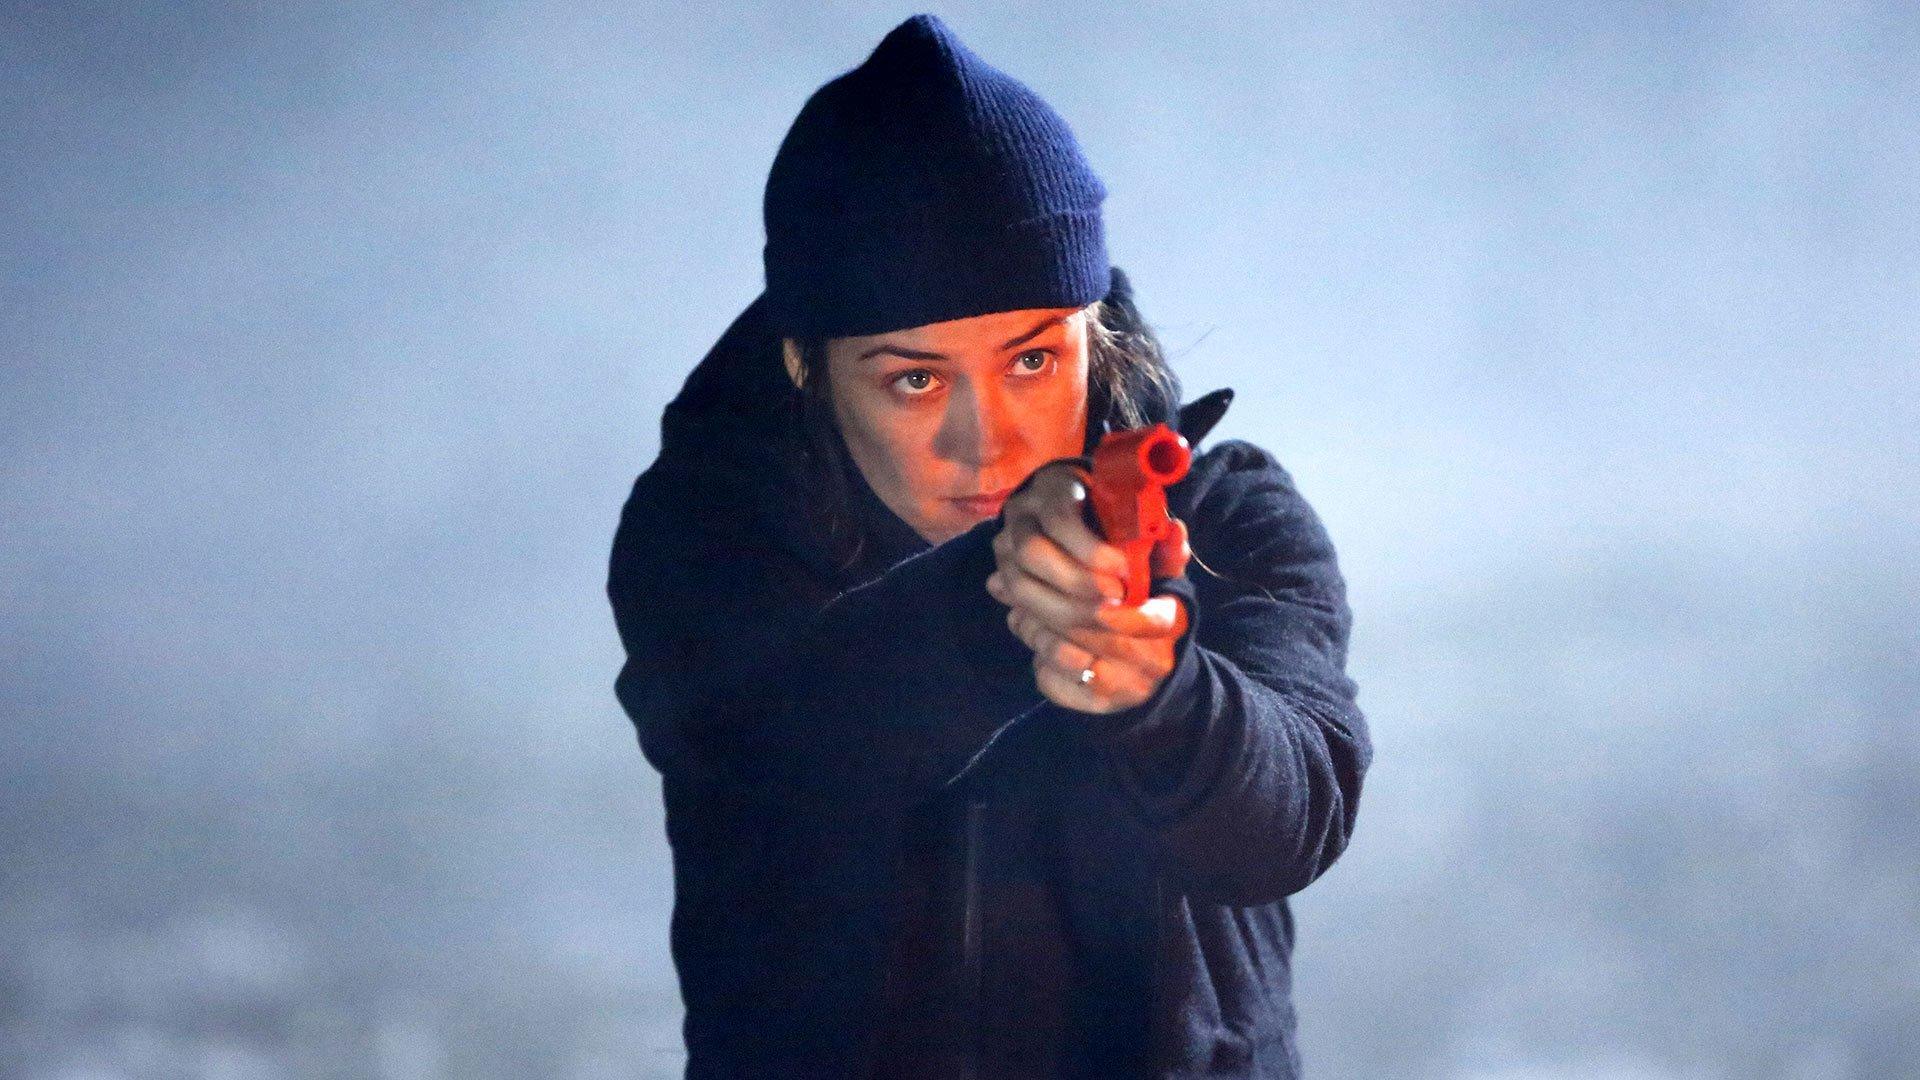 Ruin Summary - The Blacklist Season 5, Episode 9 Episode Guide